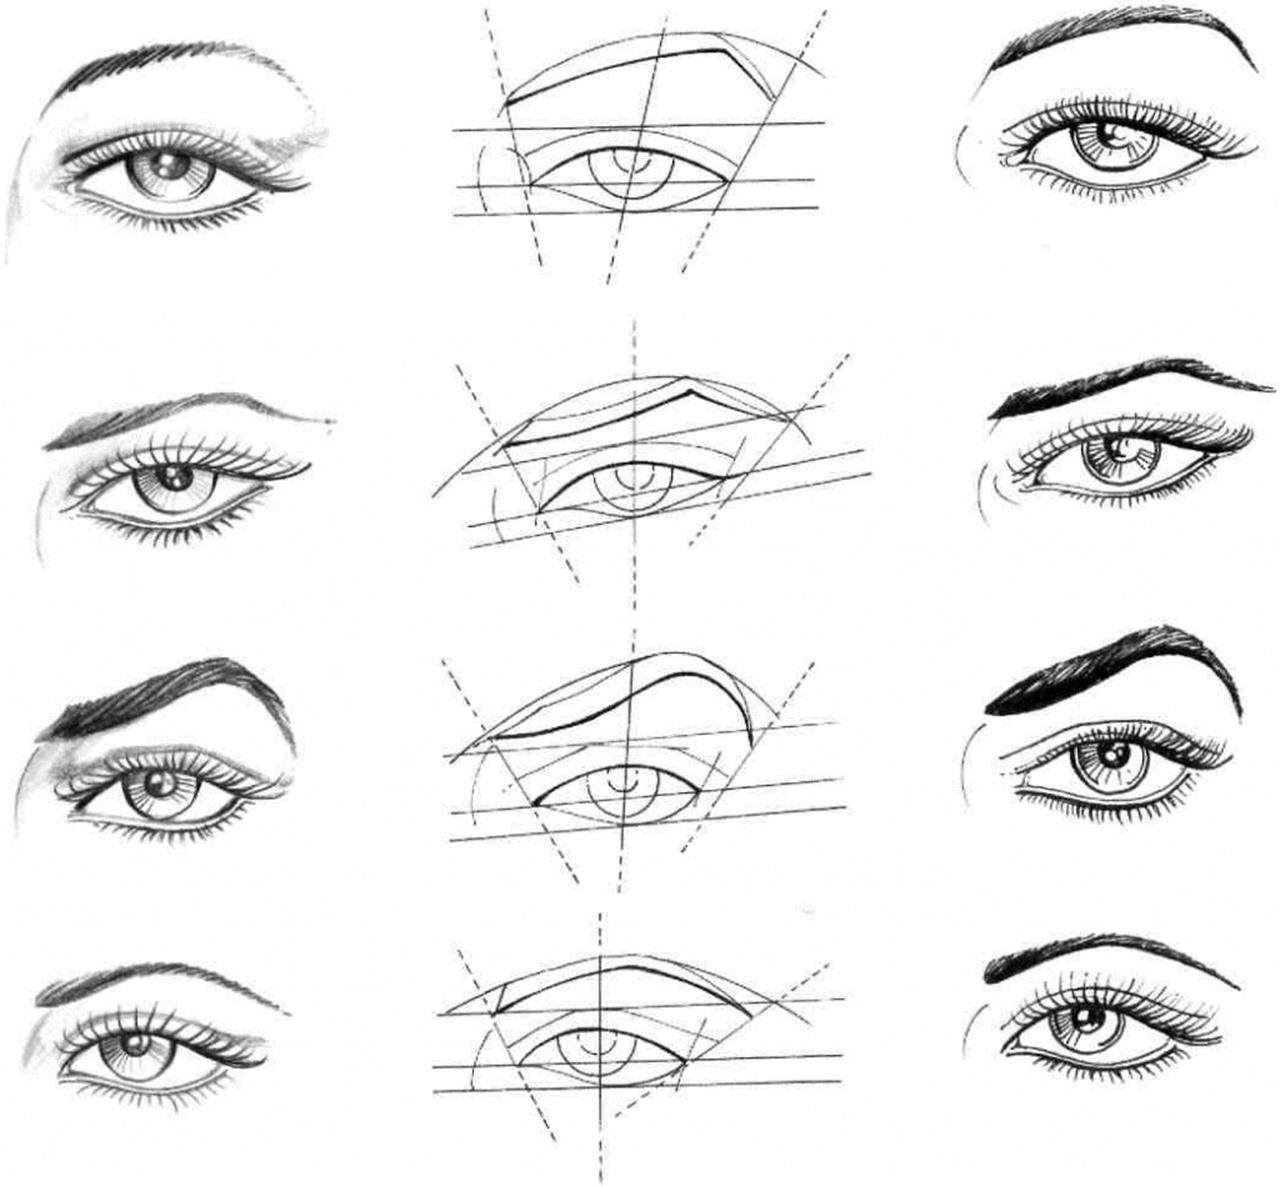 Программа для зарисовки лица на фото 14 фотография